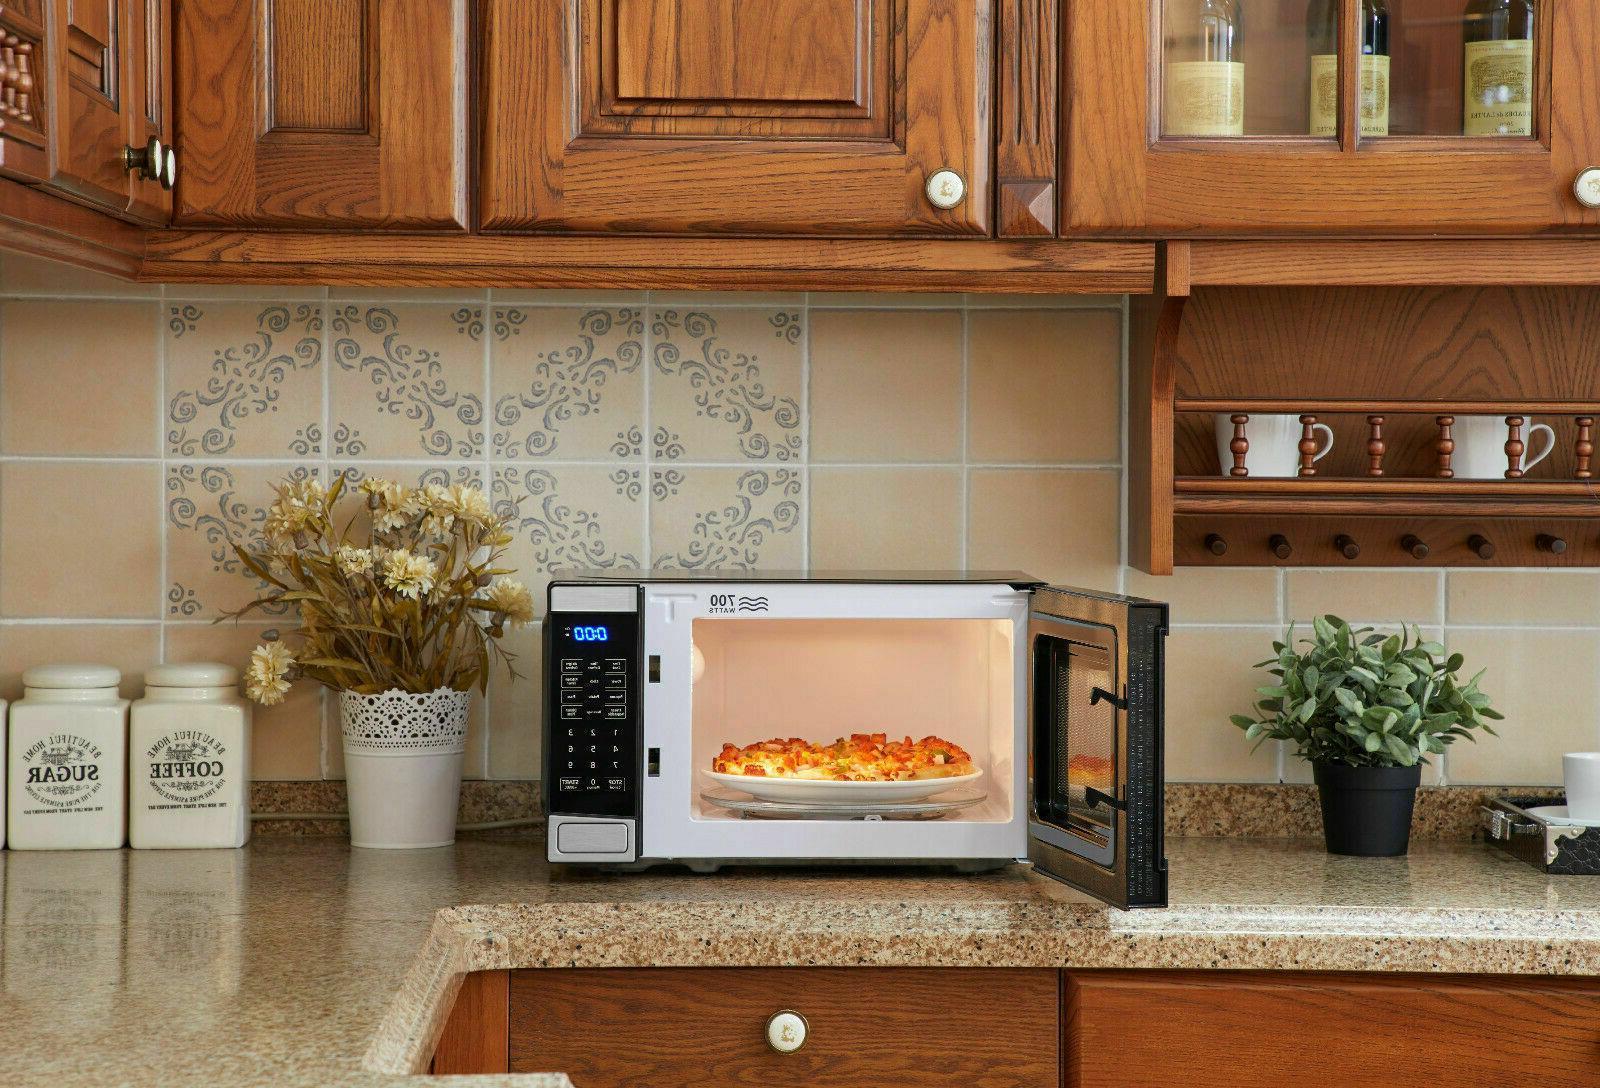 Mainstays 700W Microwave with 10 Power